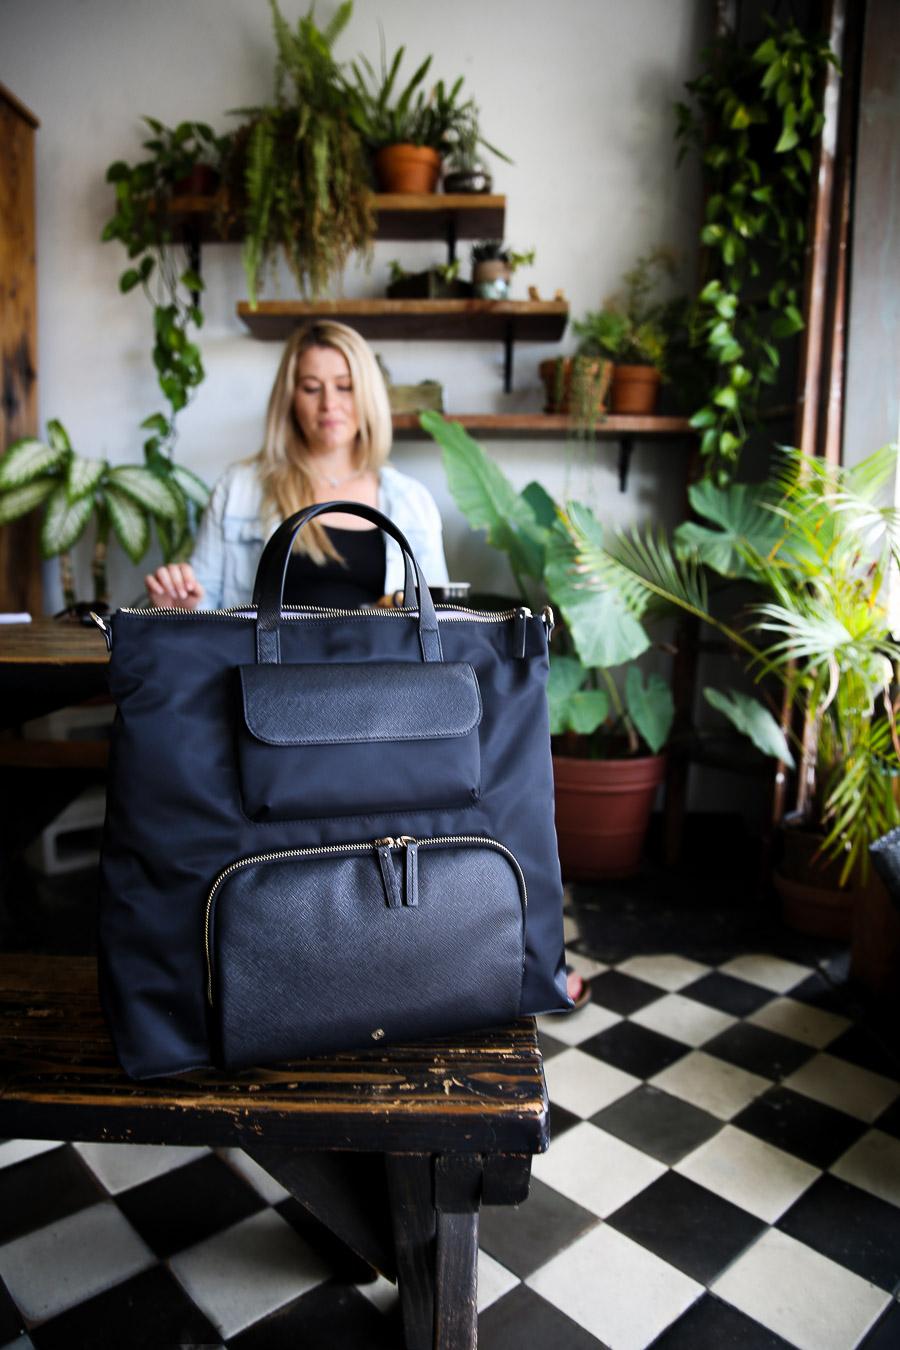 Stylish Baby Bag Backpack {Samsonite Encompass Review}